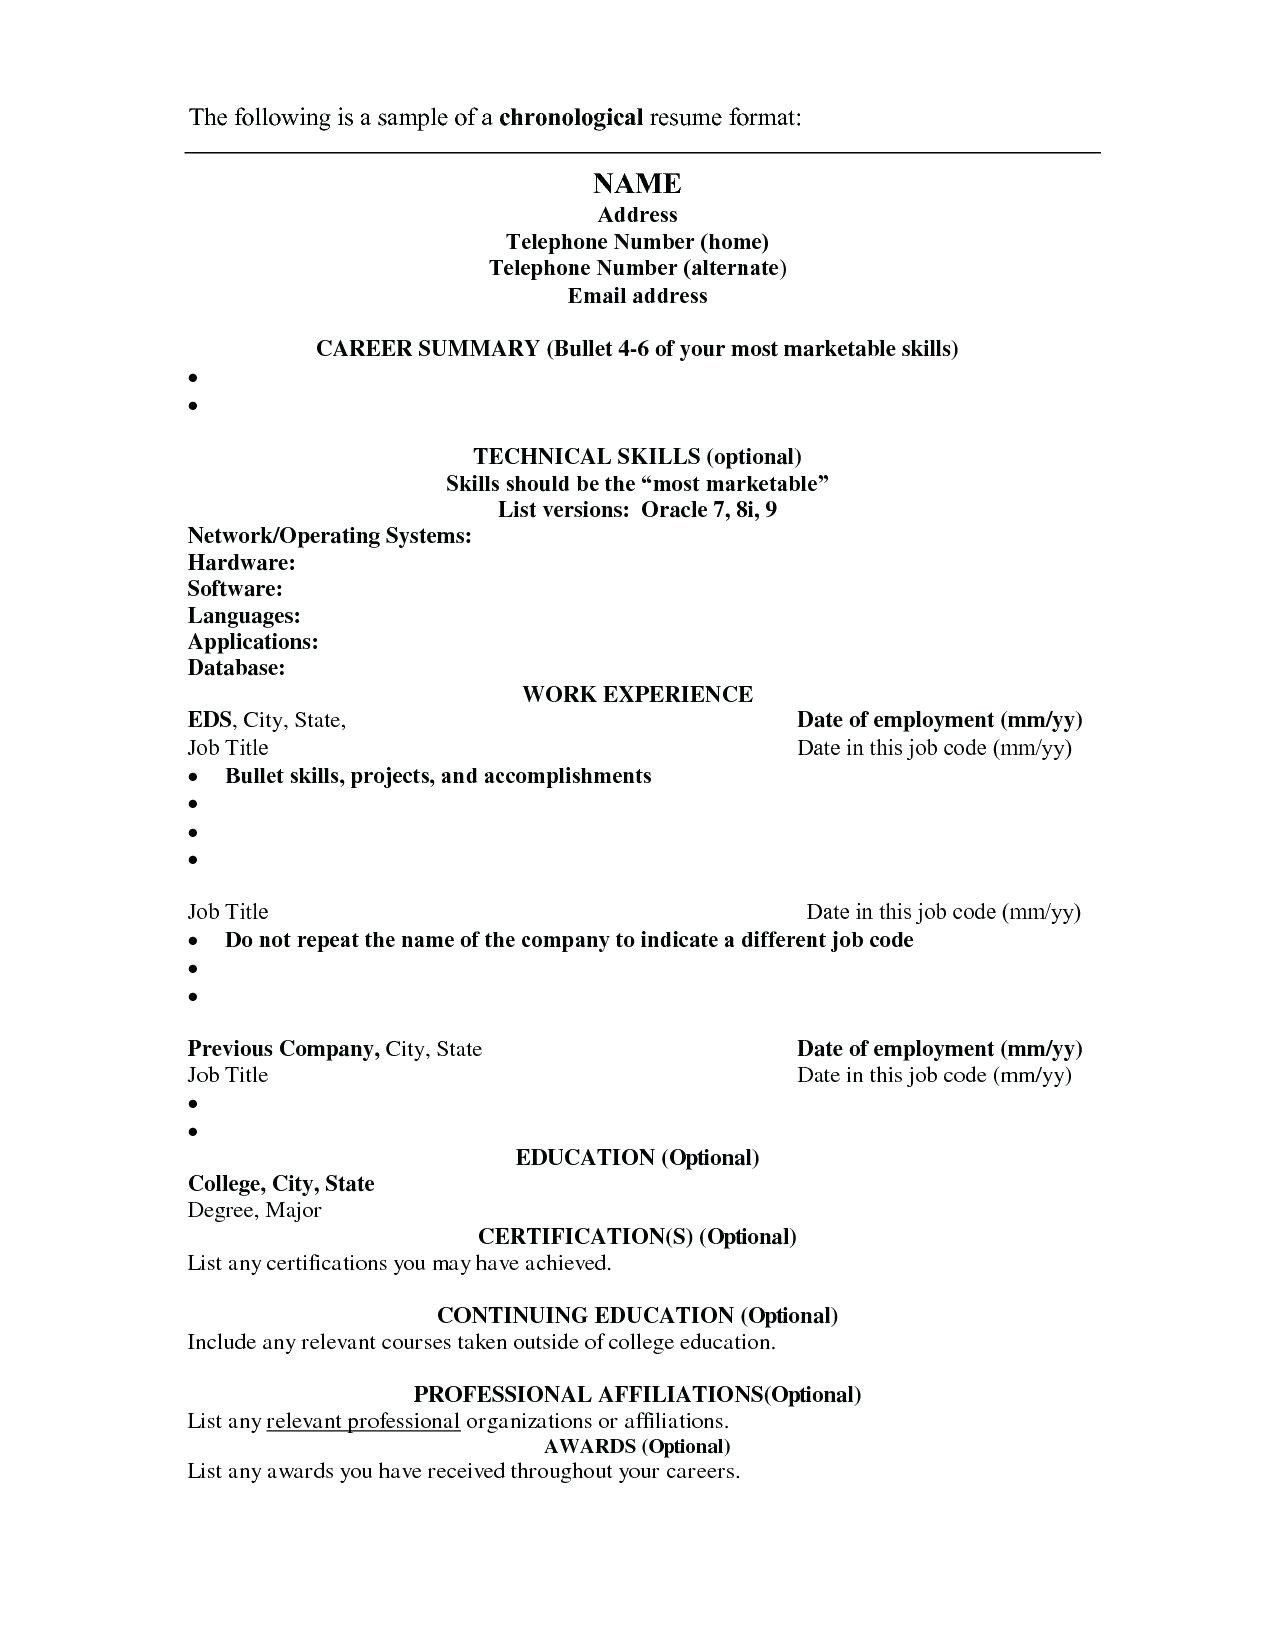 Resume Format Key Skills Resume Format Free Resume Template Word Student Resume Template Resume Skills